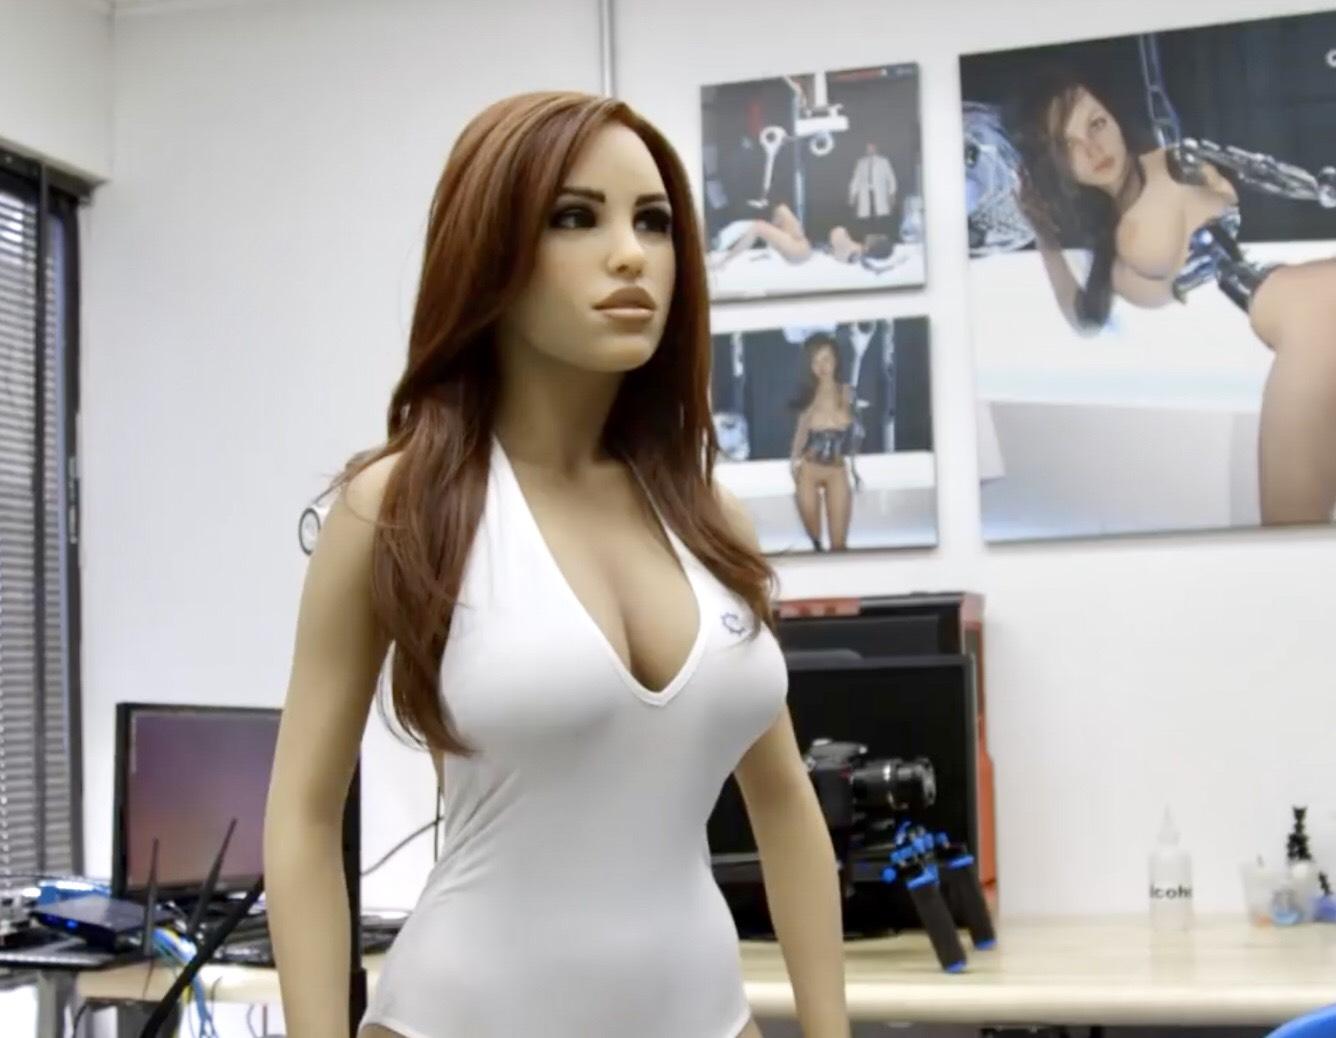 Harmony, a lifelike sex robot produced by Realbotix. Source: Youtube